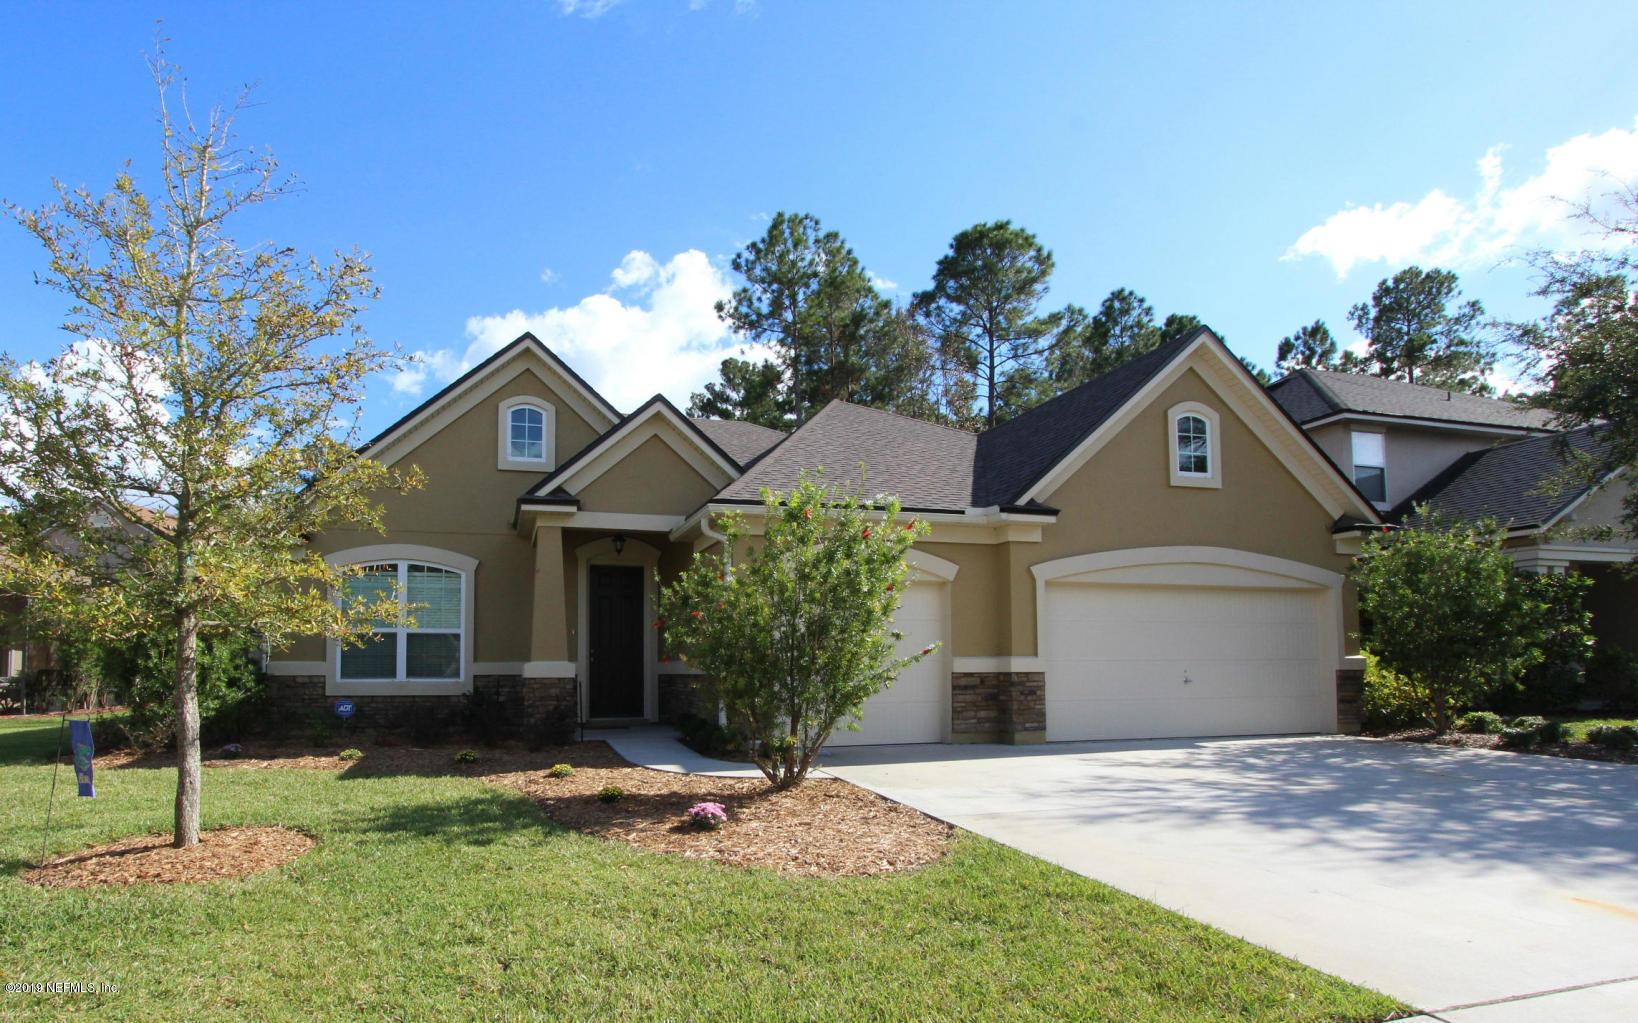 1845 CROSS GREEN, FLEMING ISLAND, FLORIDA 32003, 4 Bedrooms Bedrooms, ,2 BathroomsBathrooms,Residential - single family,For sale,CROSS GREEN,1000859